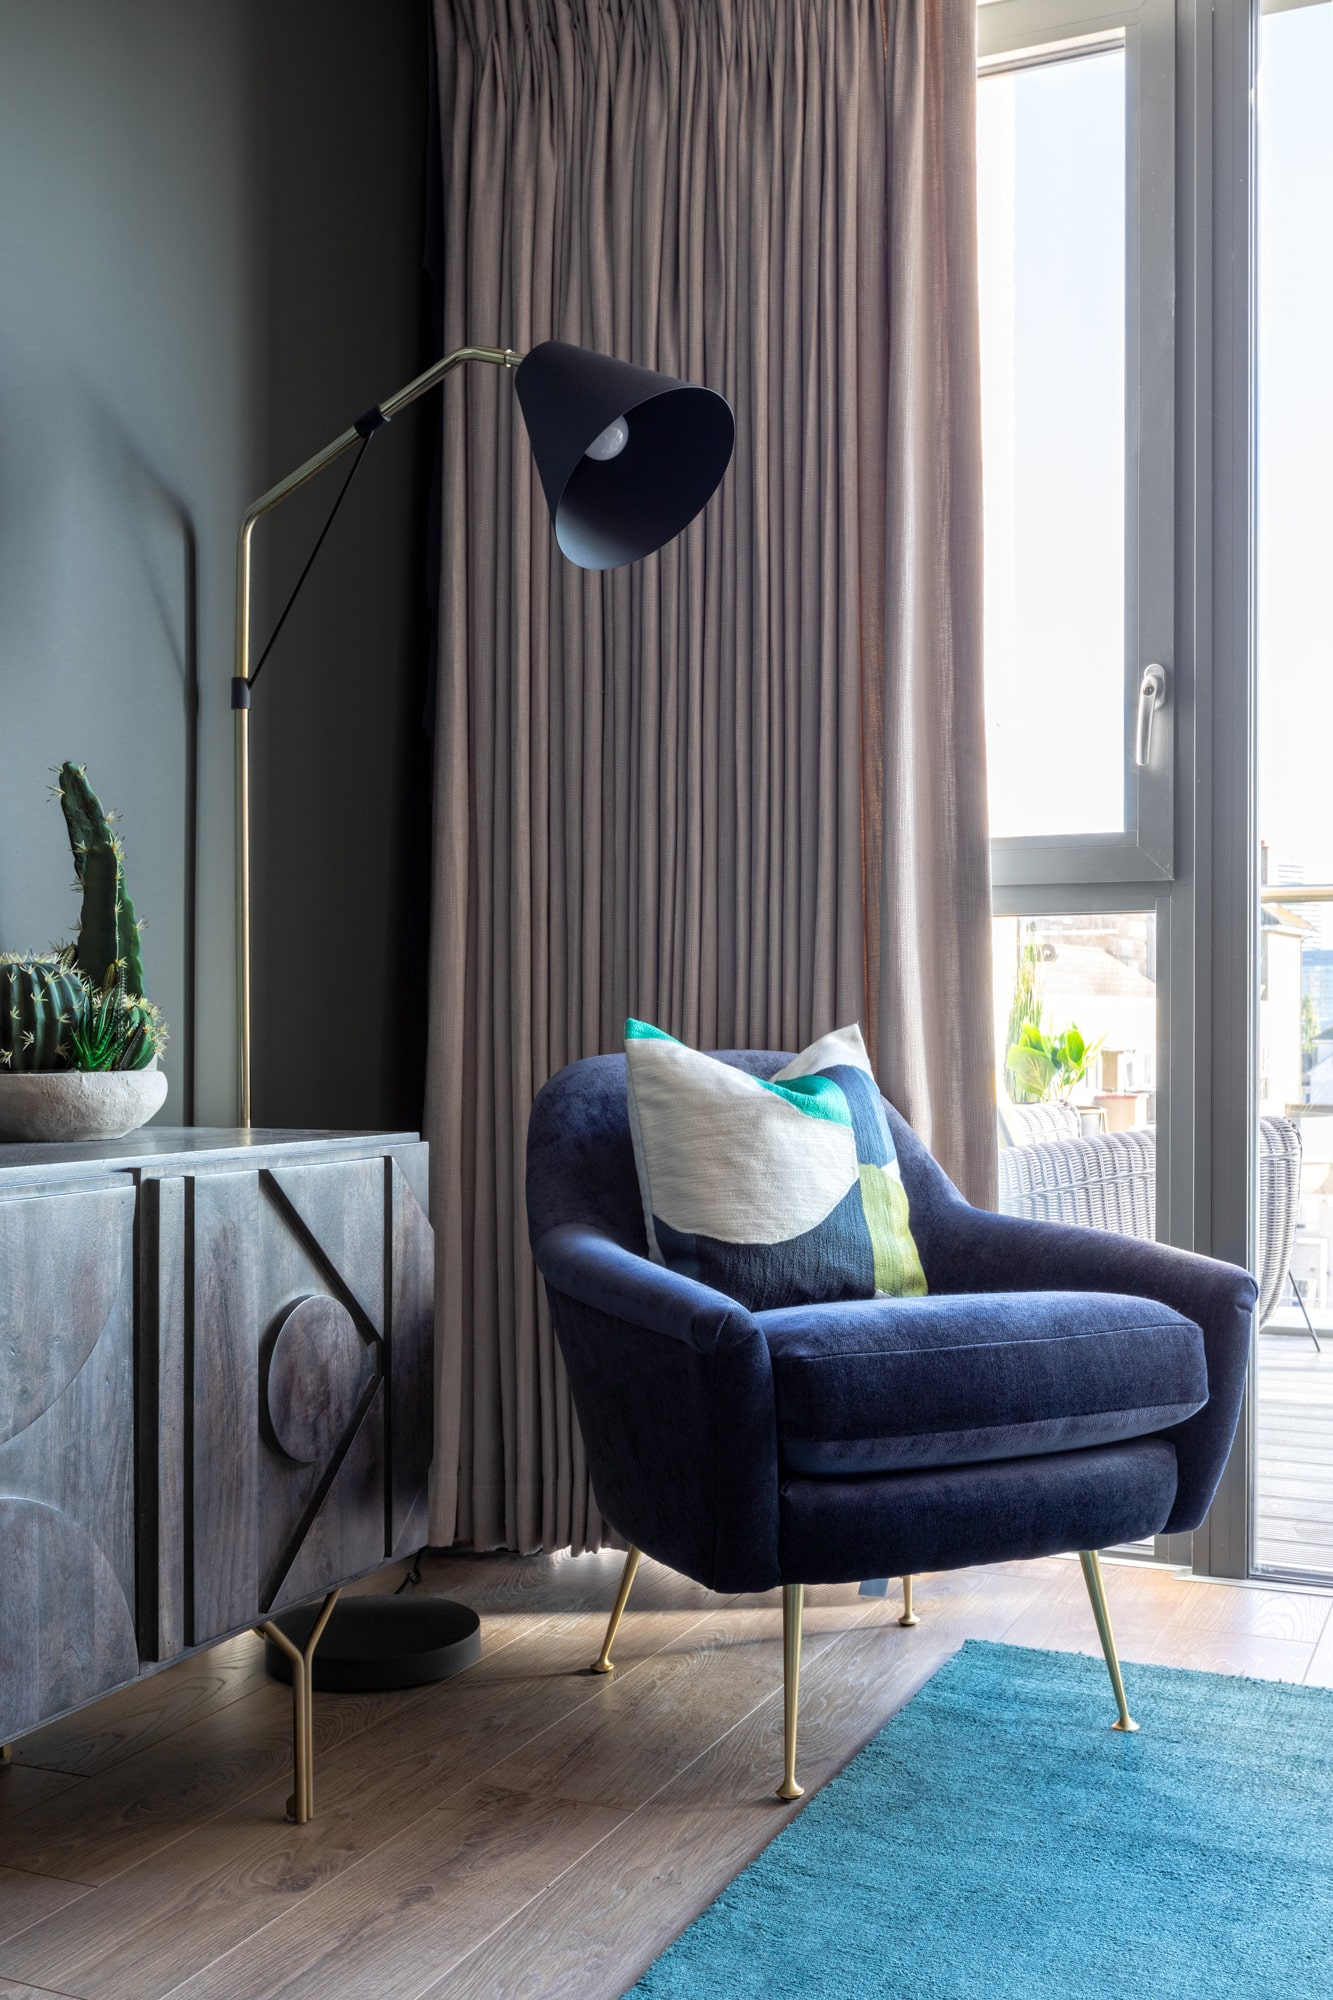 interior design photo: blue velvet armchair next to the window; wooden tv stand